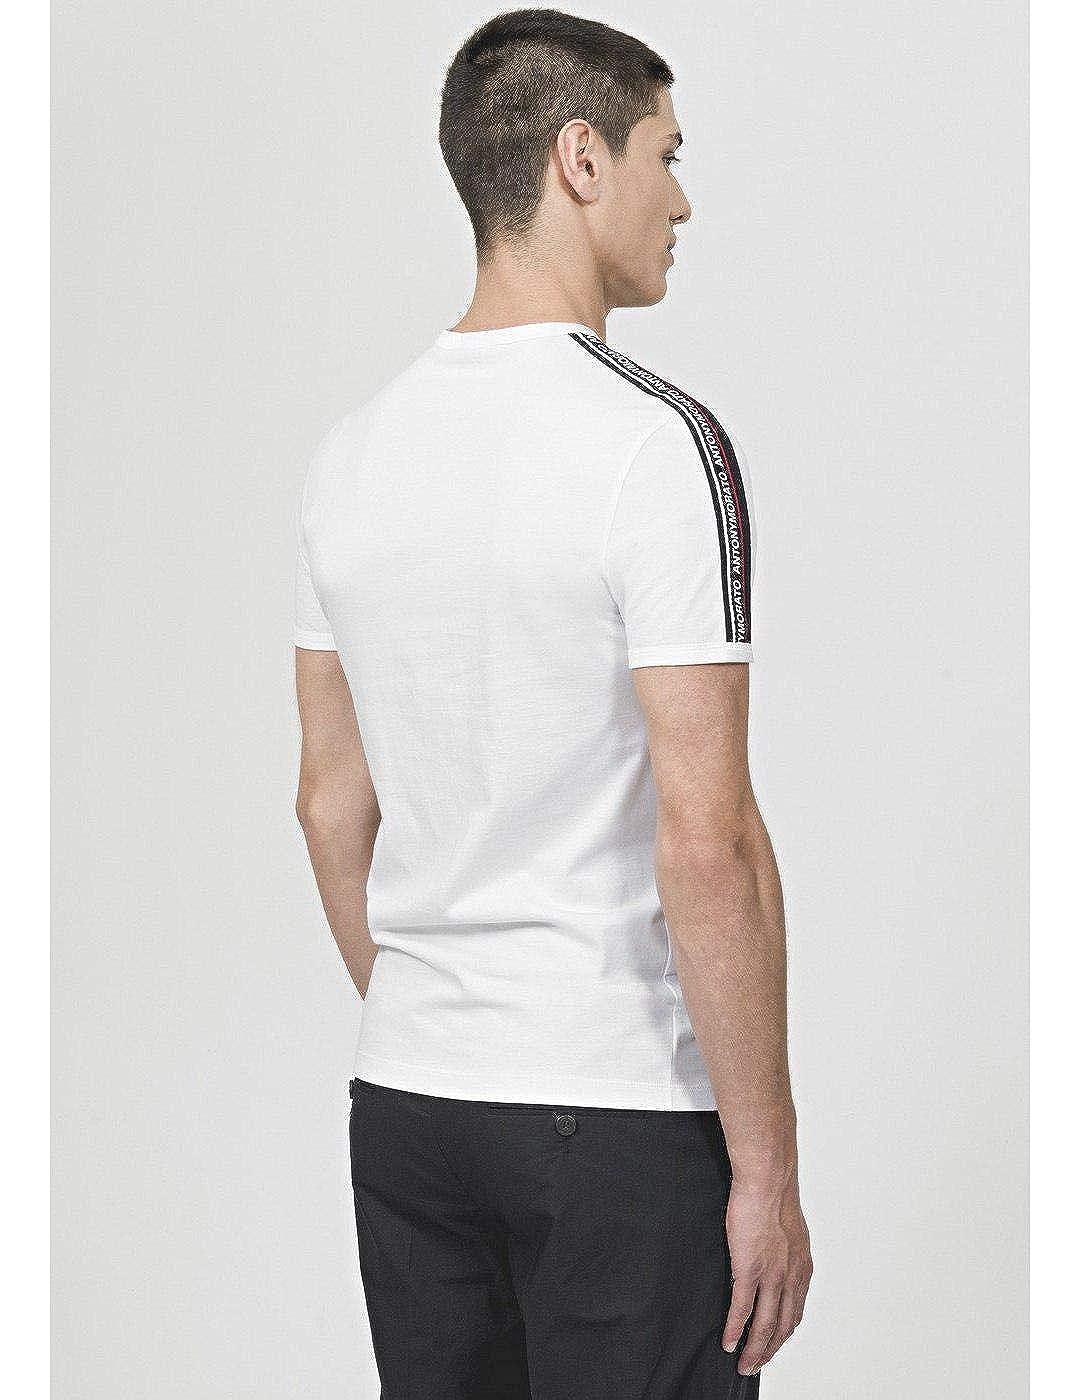 Antony Morato Camiseta Nastro Logato Blanco Hombre: Amazon.es ...